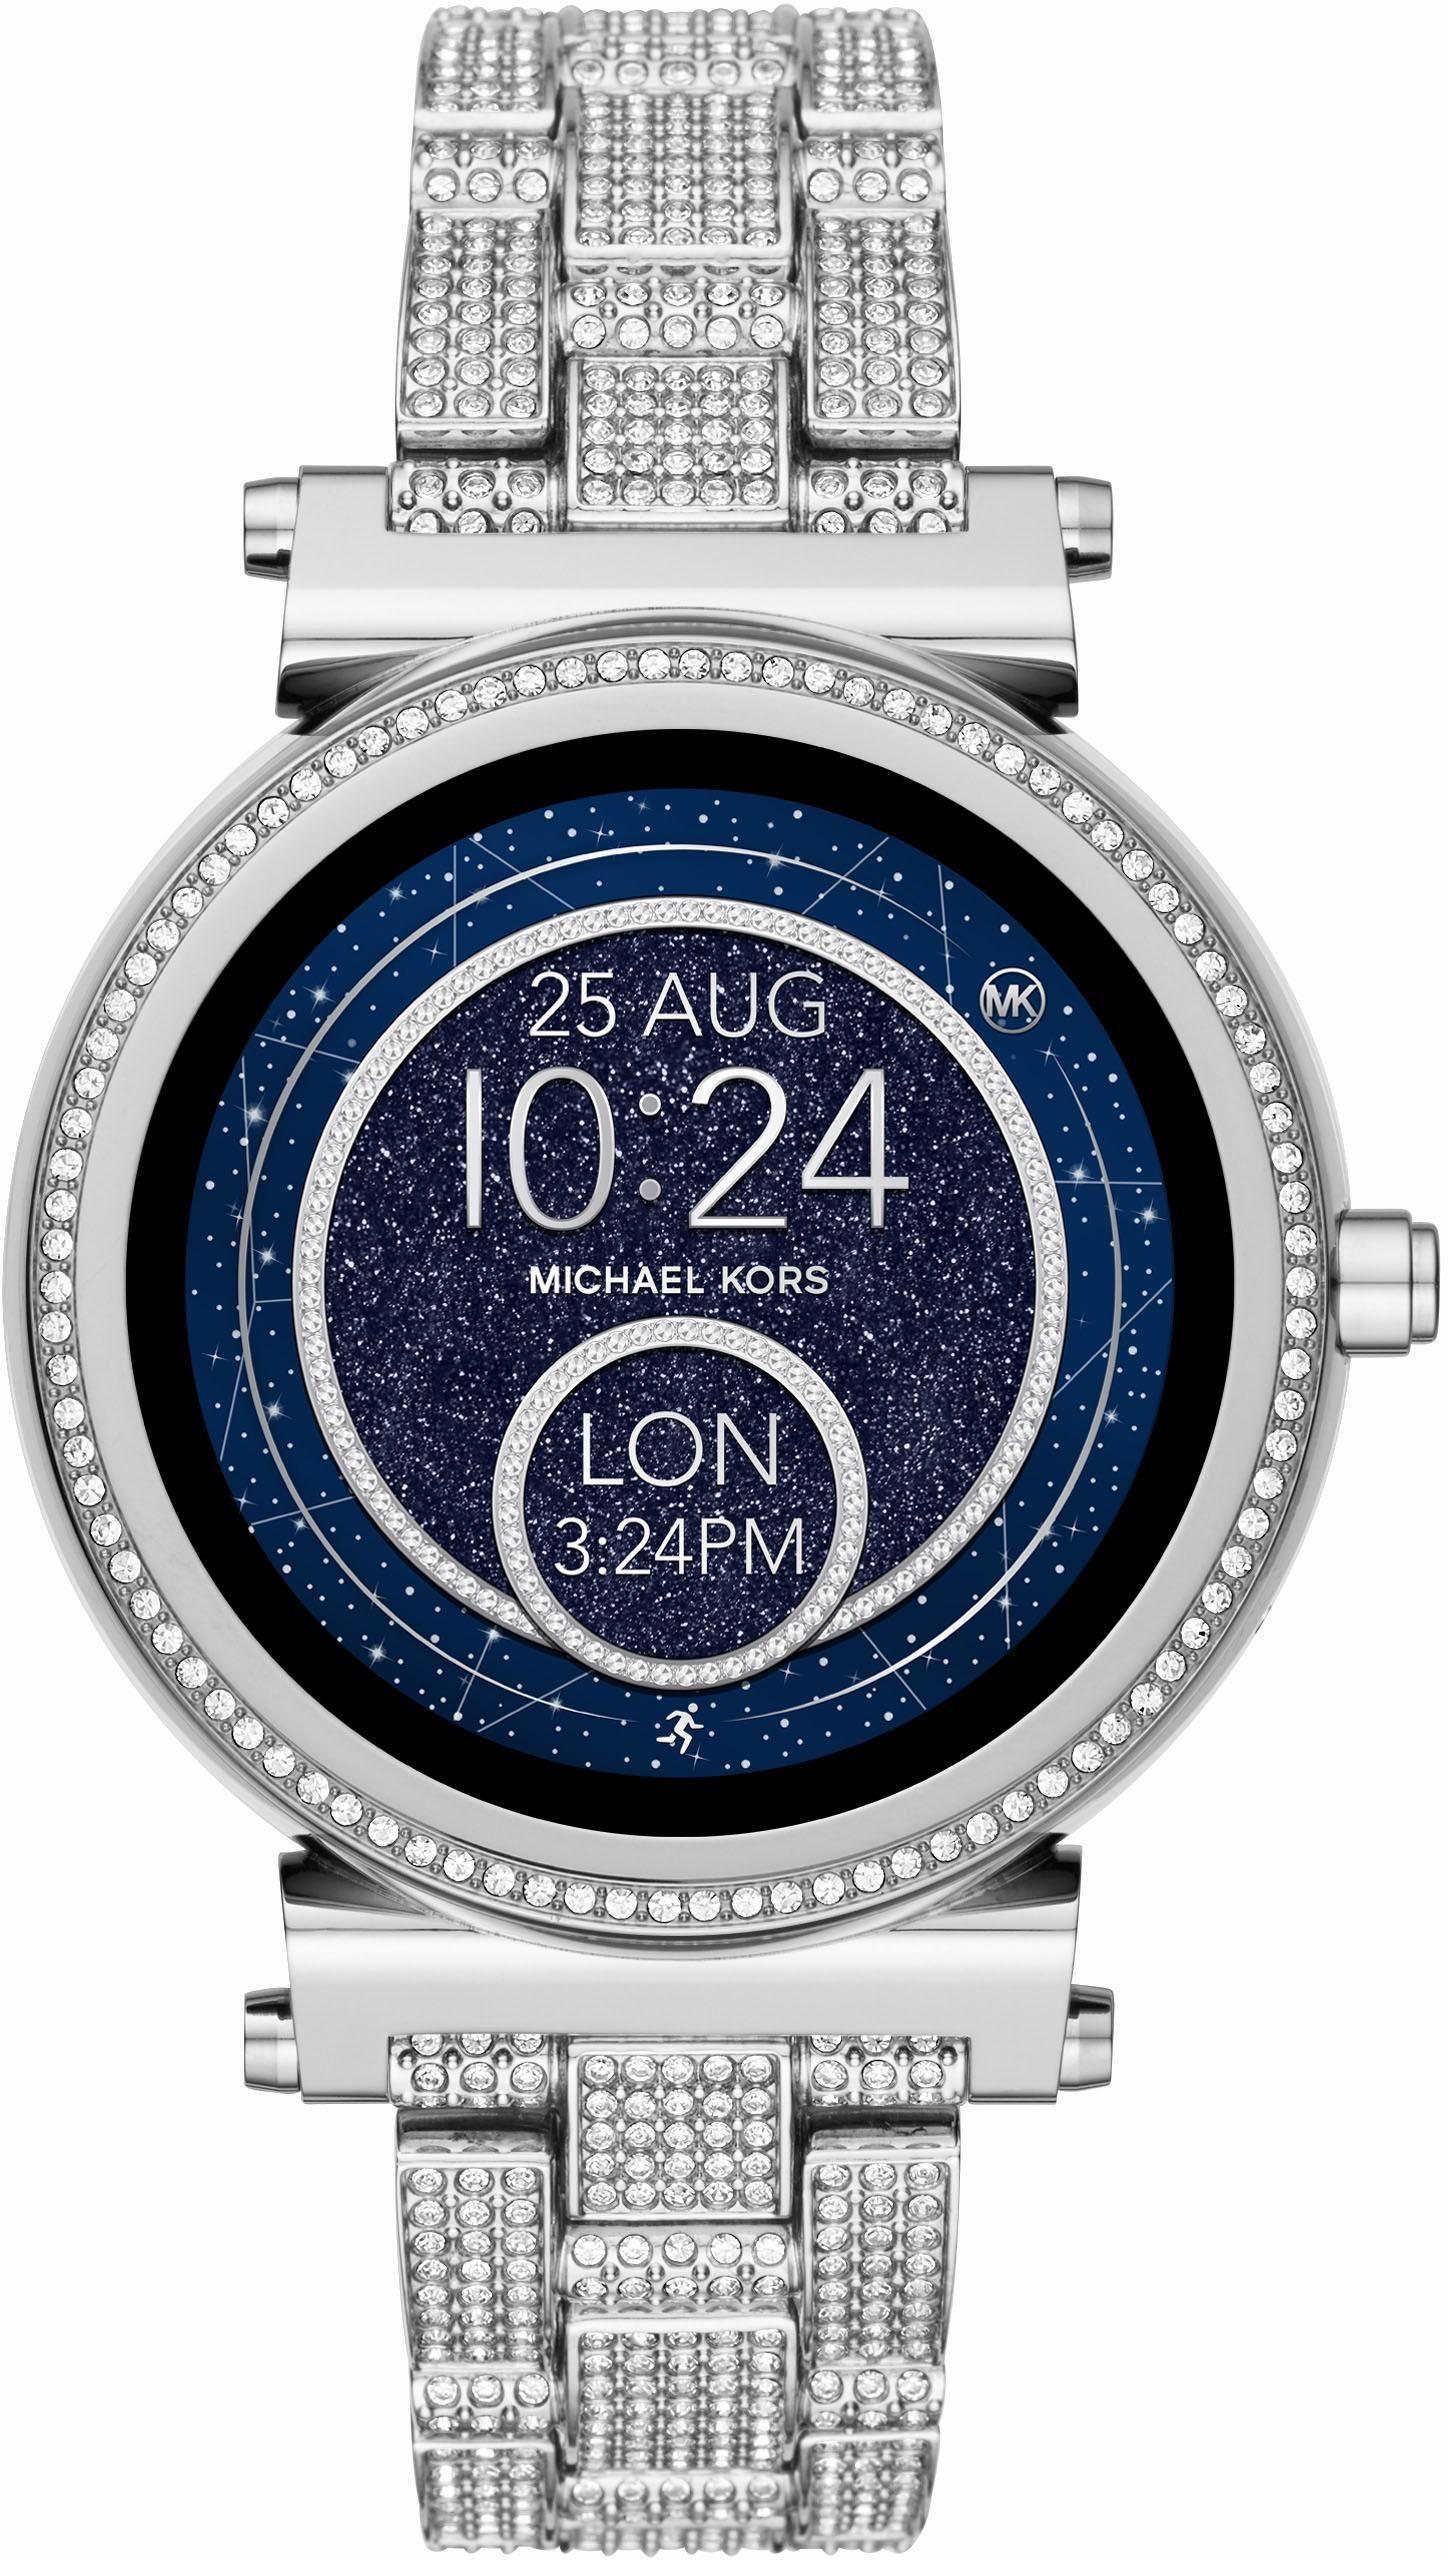 MICHAEL KORS ACCESS SOFIE, MKT5024 Smartwatch (Android Wear, inkl. Dornschließe für Wechselband)